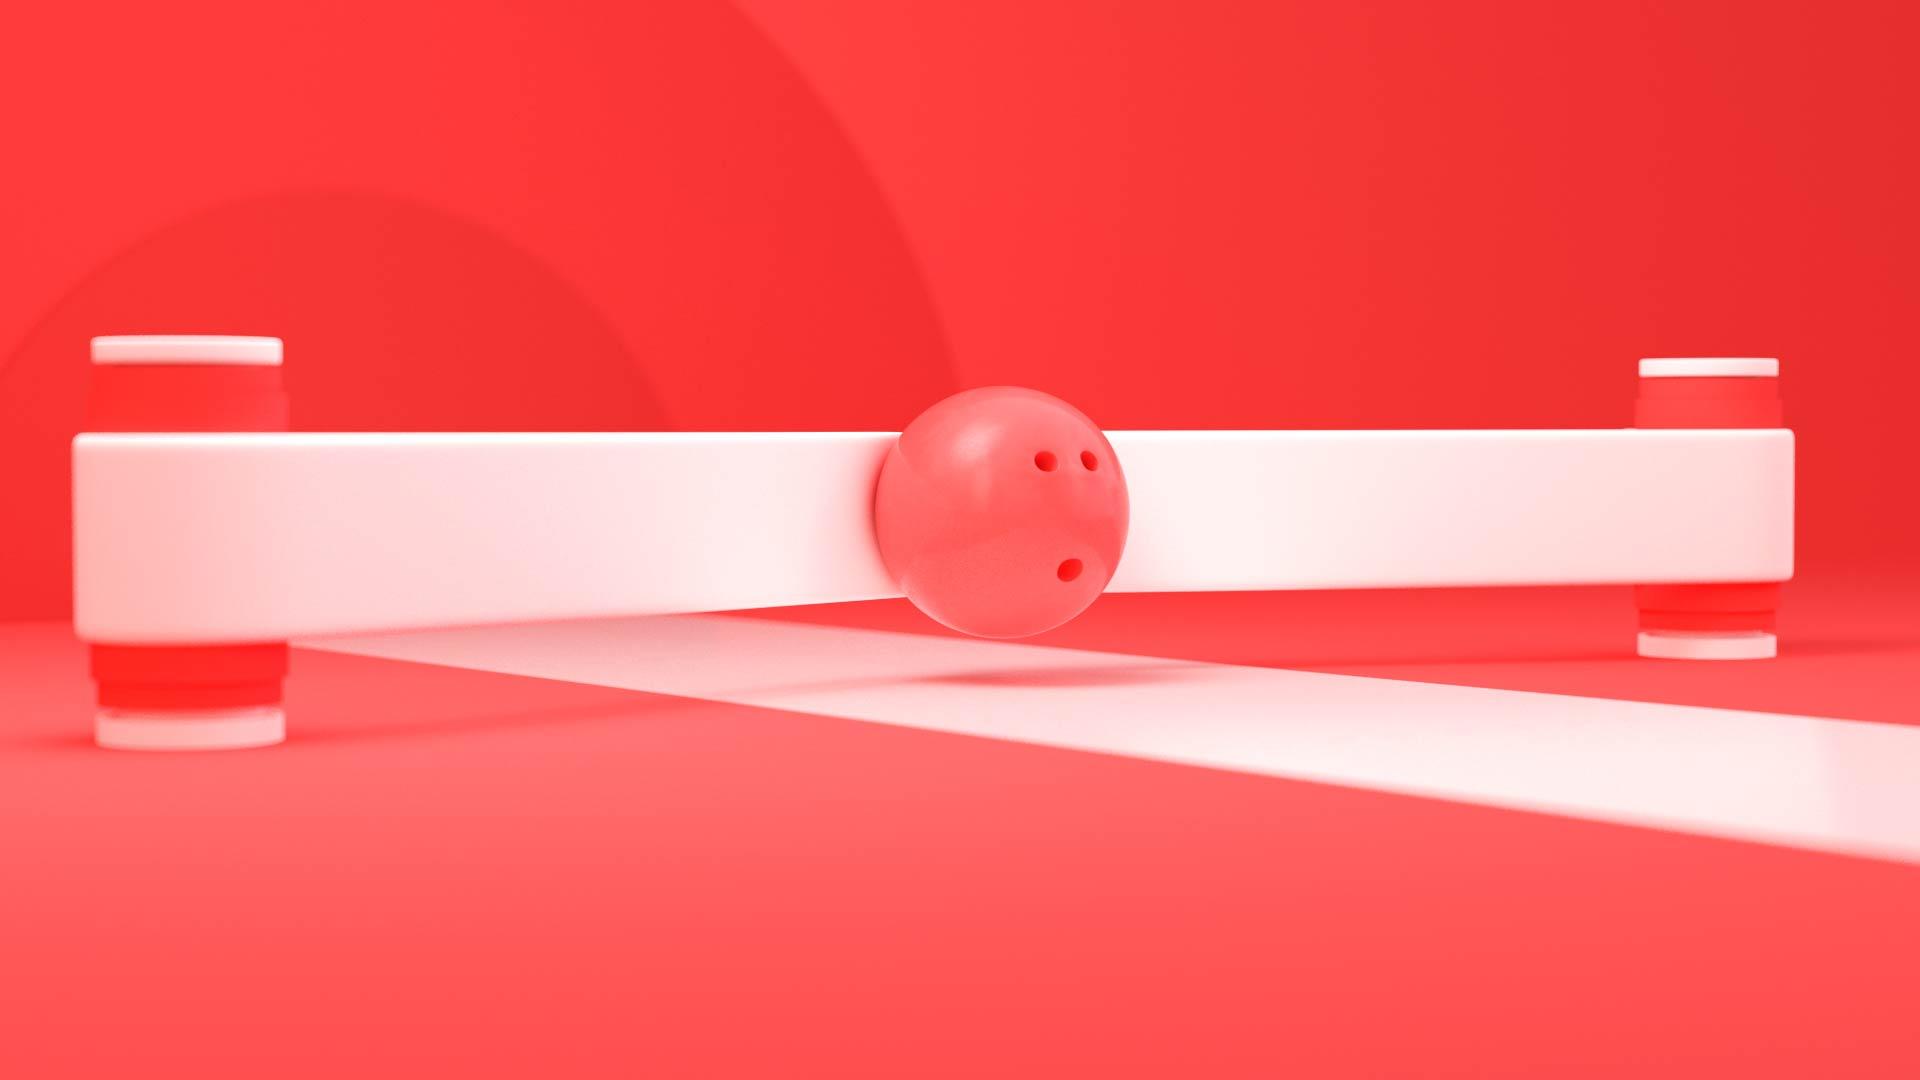 Zone Bowling (0-00-32-00)